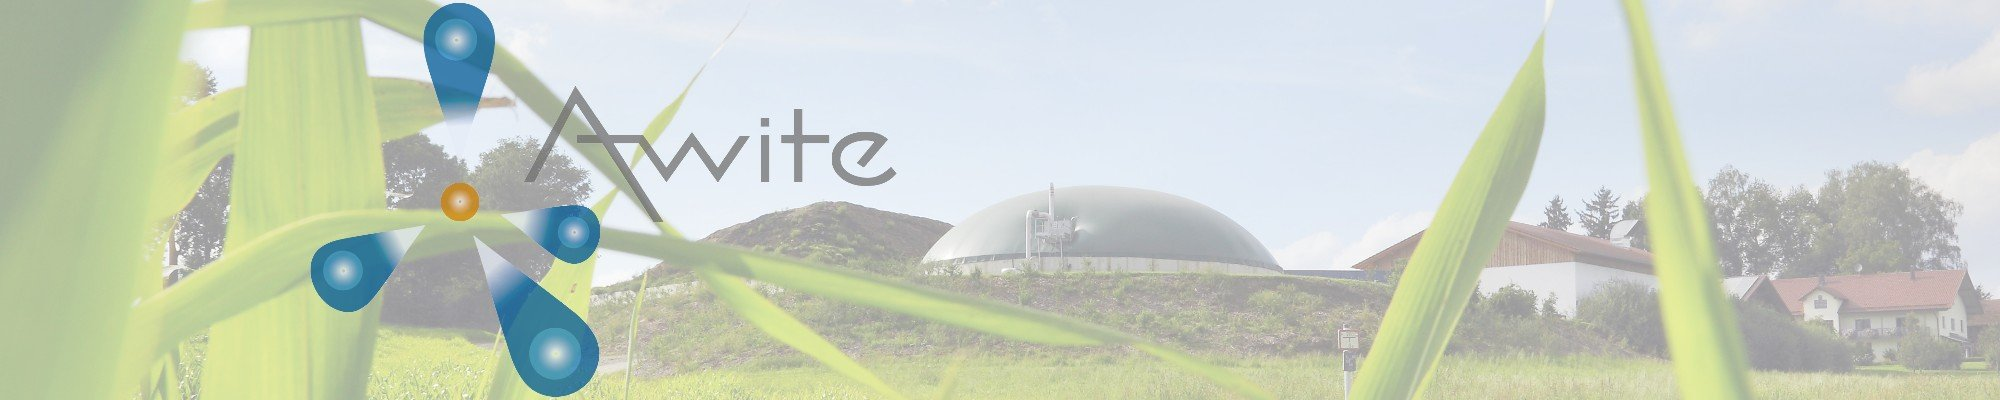 Awite Biogasanalyser - ODS web page header